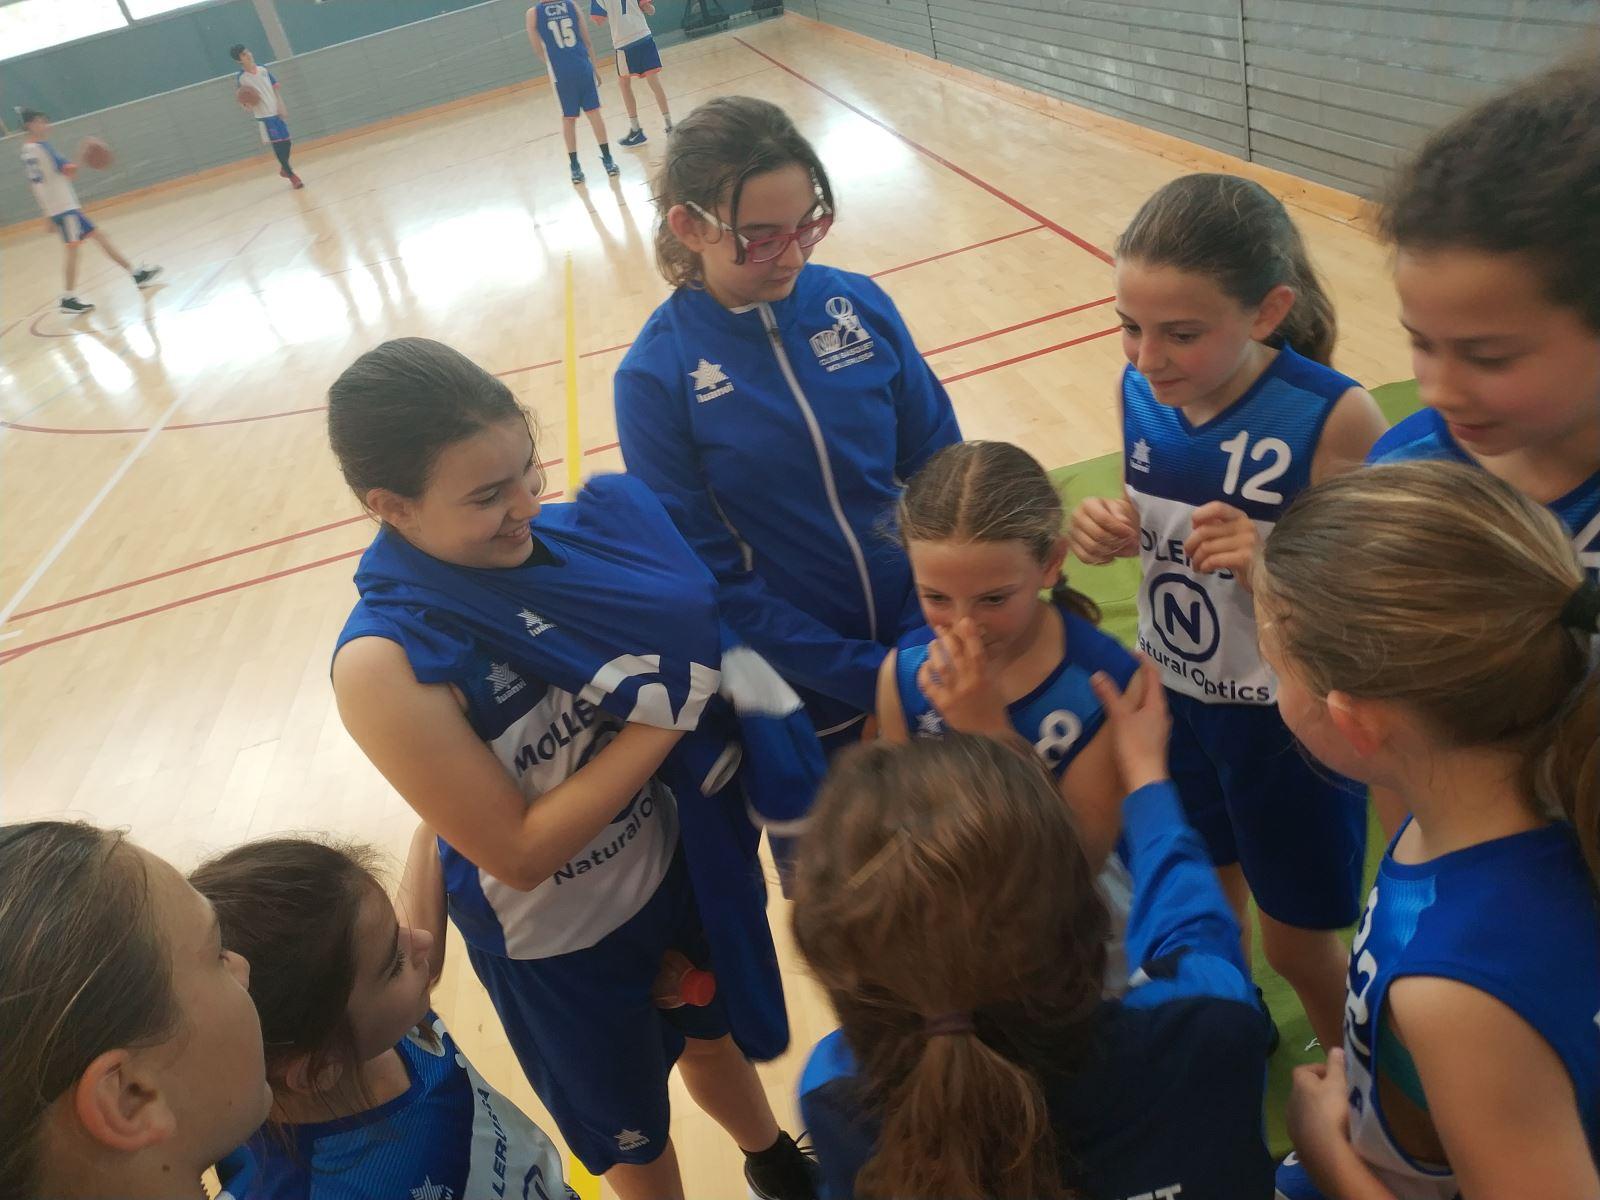 C.N. Tarrega Blau 28-45 Club Bàsquet Mollerussa (28/04/2018)